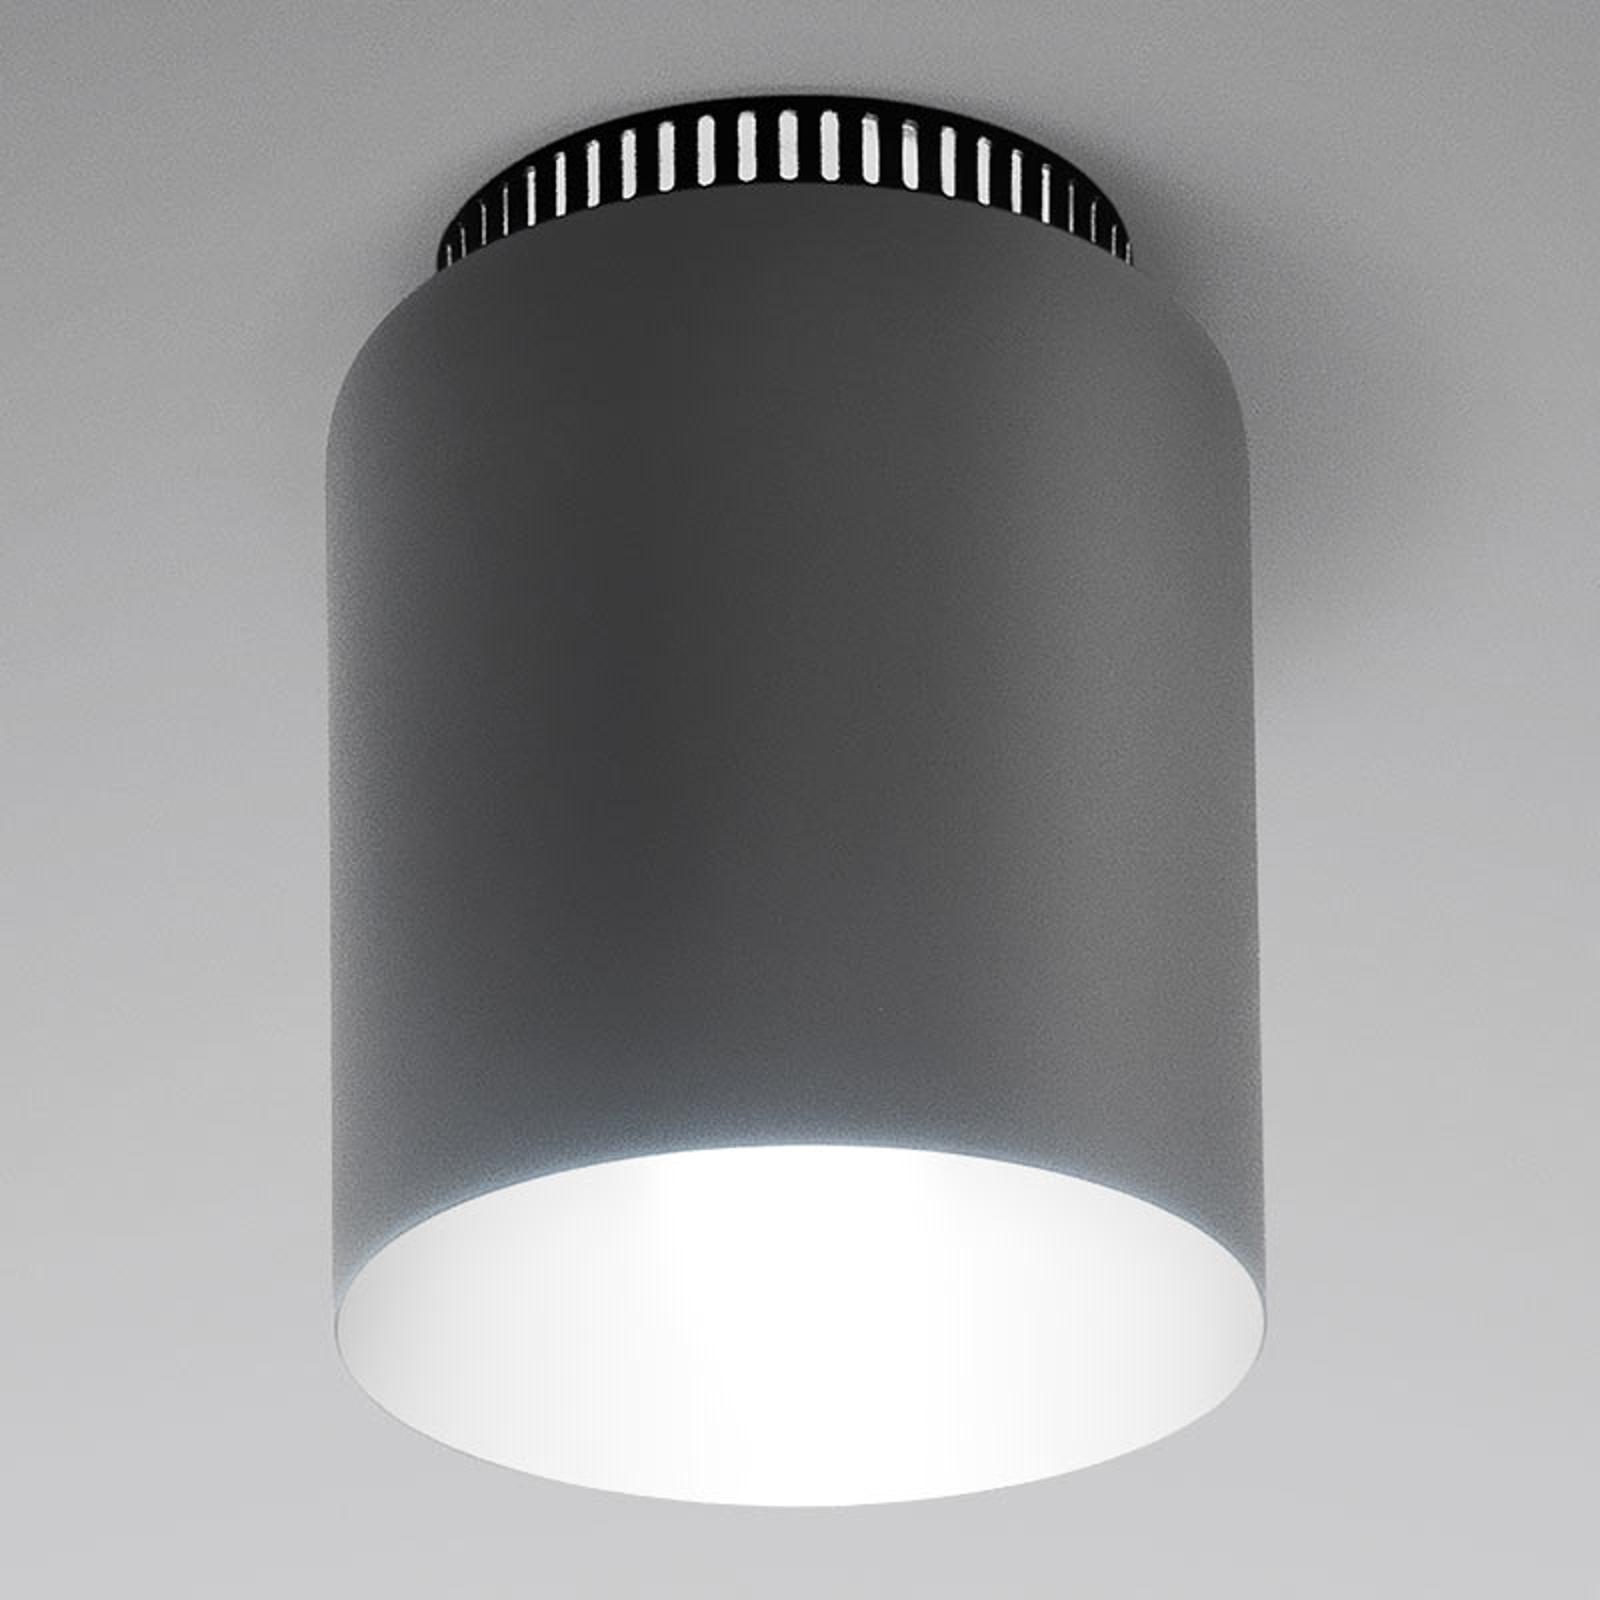 Designer-Deckenleuchte Aspen C17A LED grau